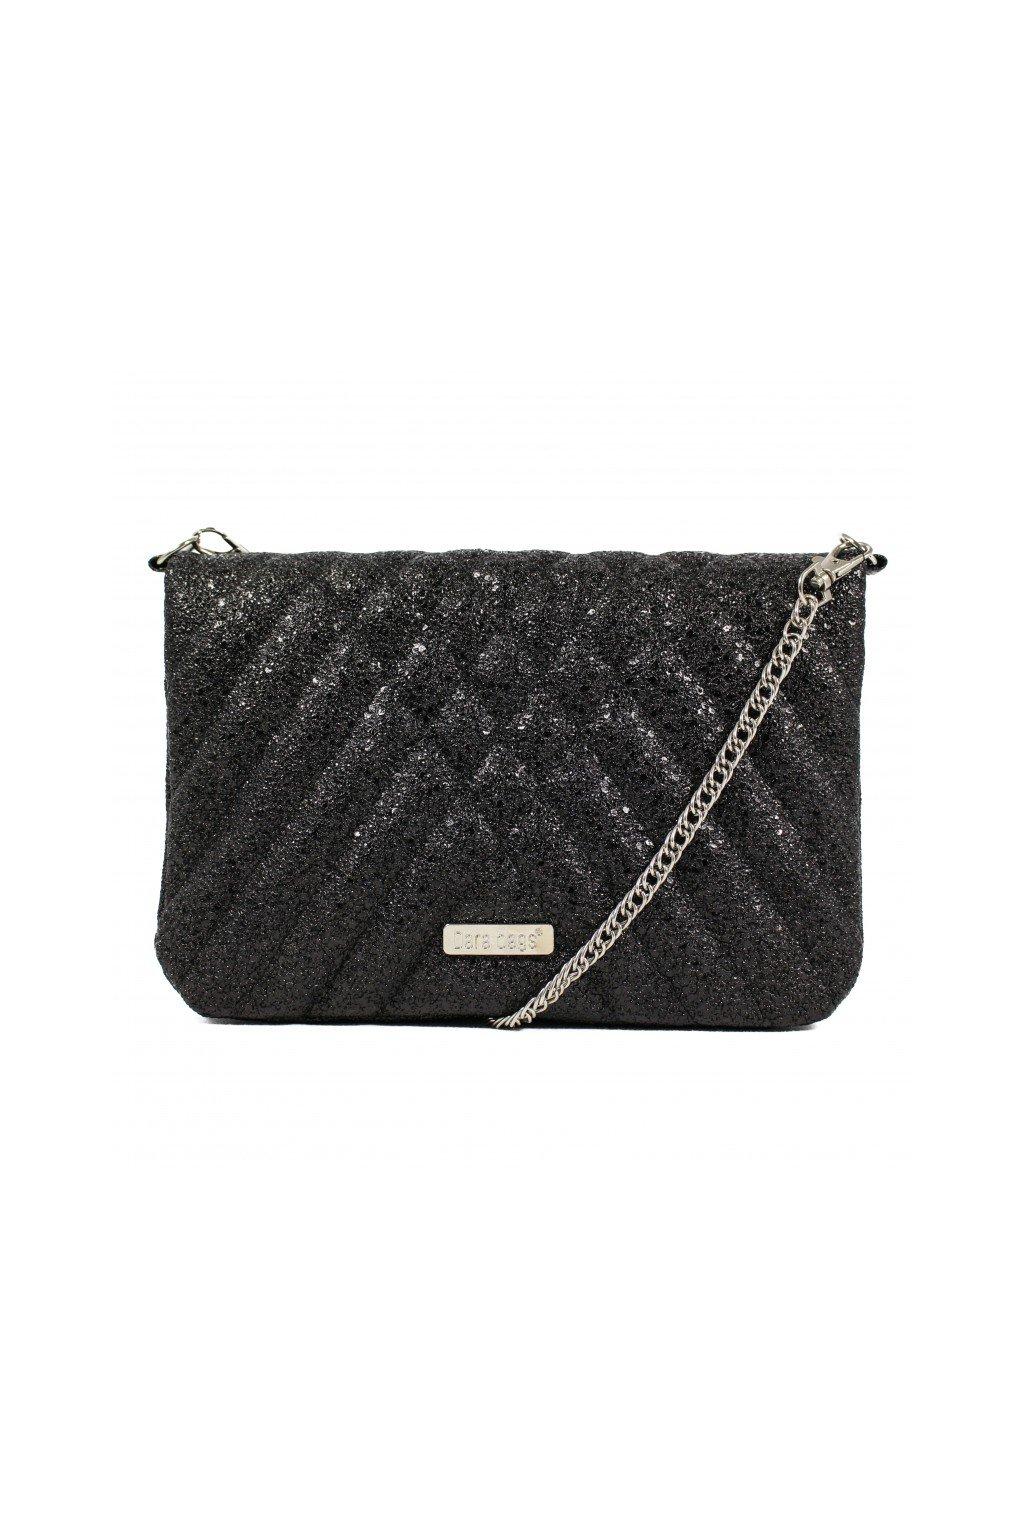 Elegantní třpytivá malá kabelka Cocktail Chick Dara bags černá 1